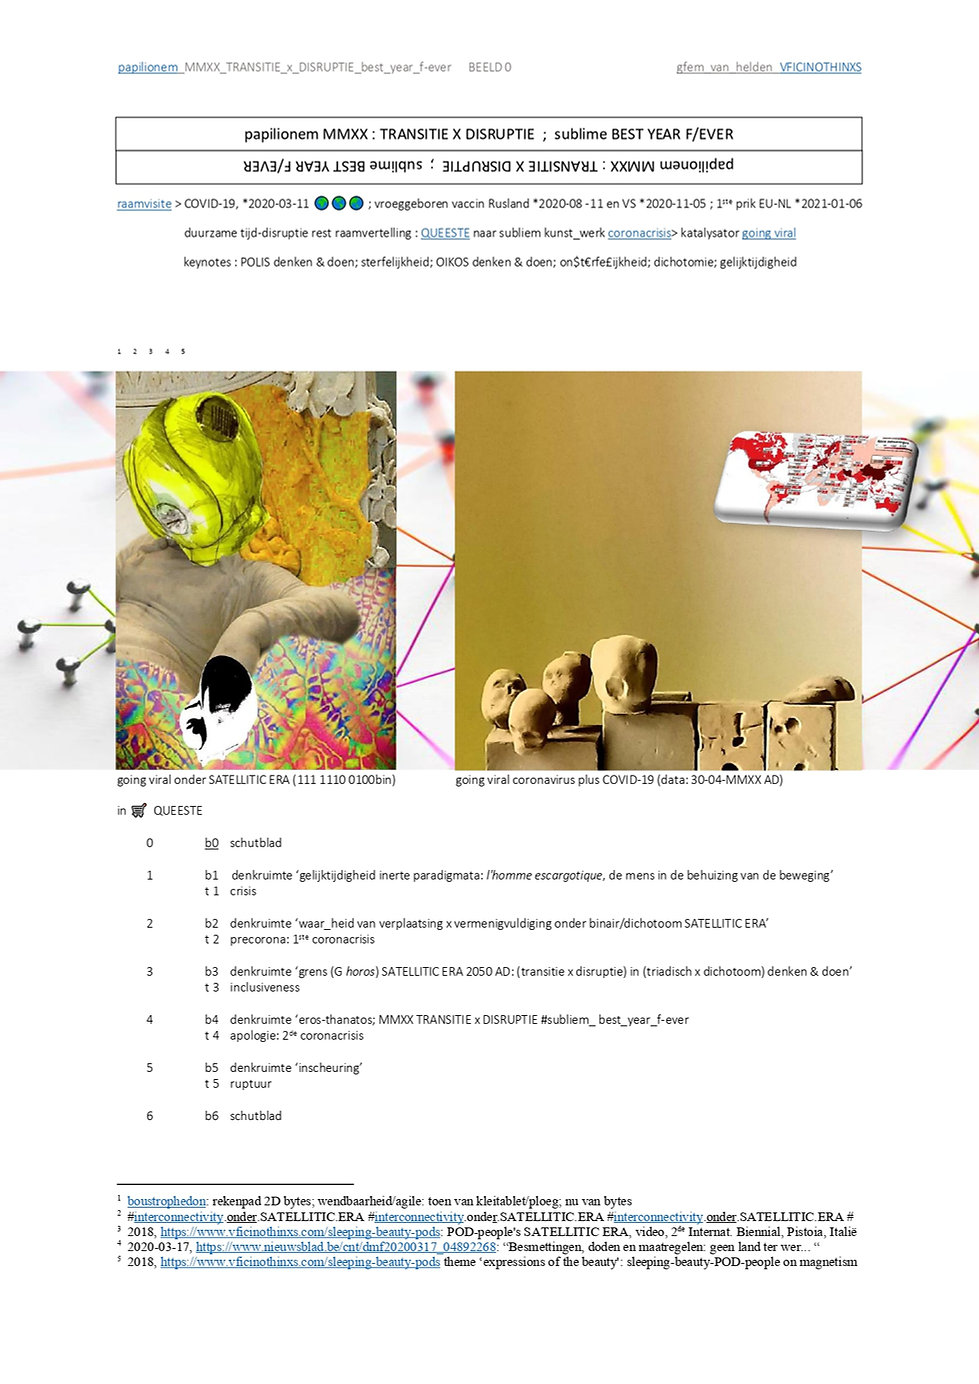 1 papilionem beeld 0_page-0001.jpg